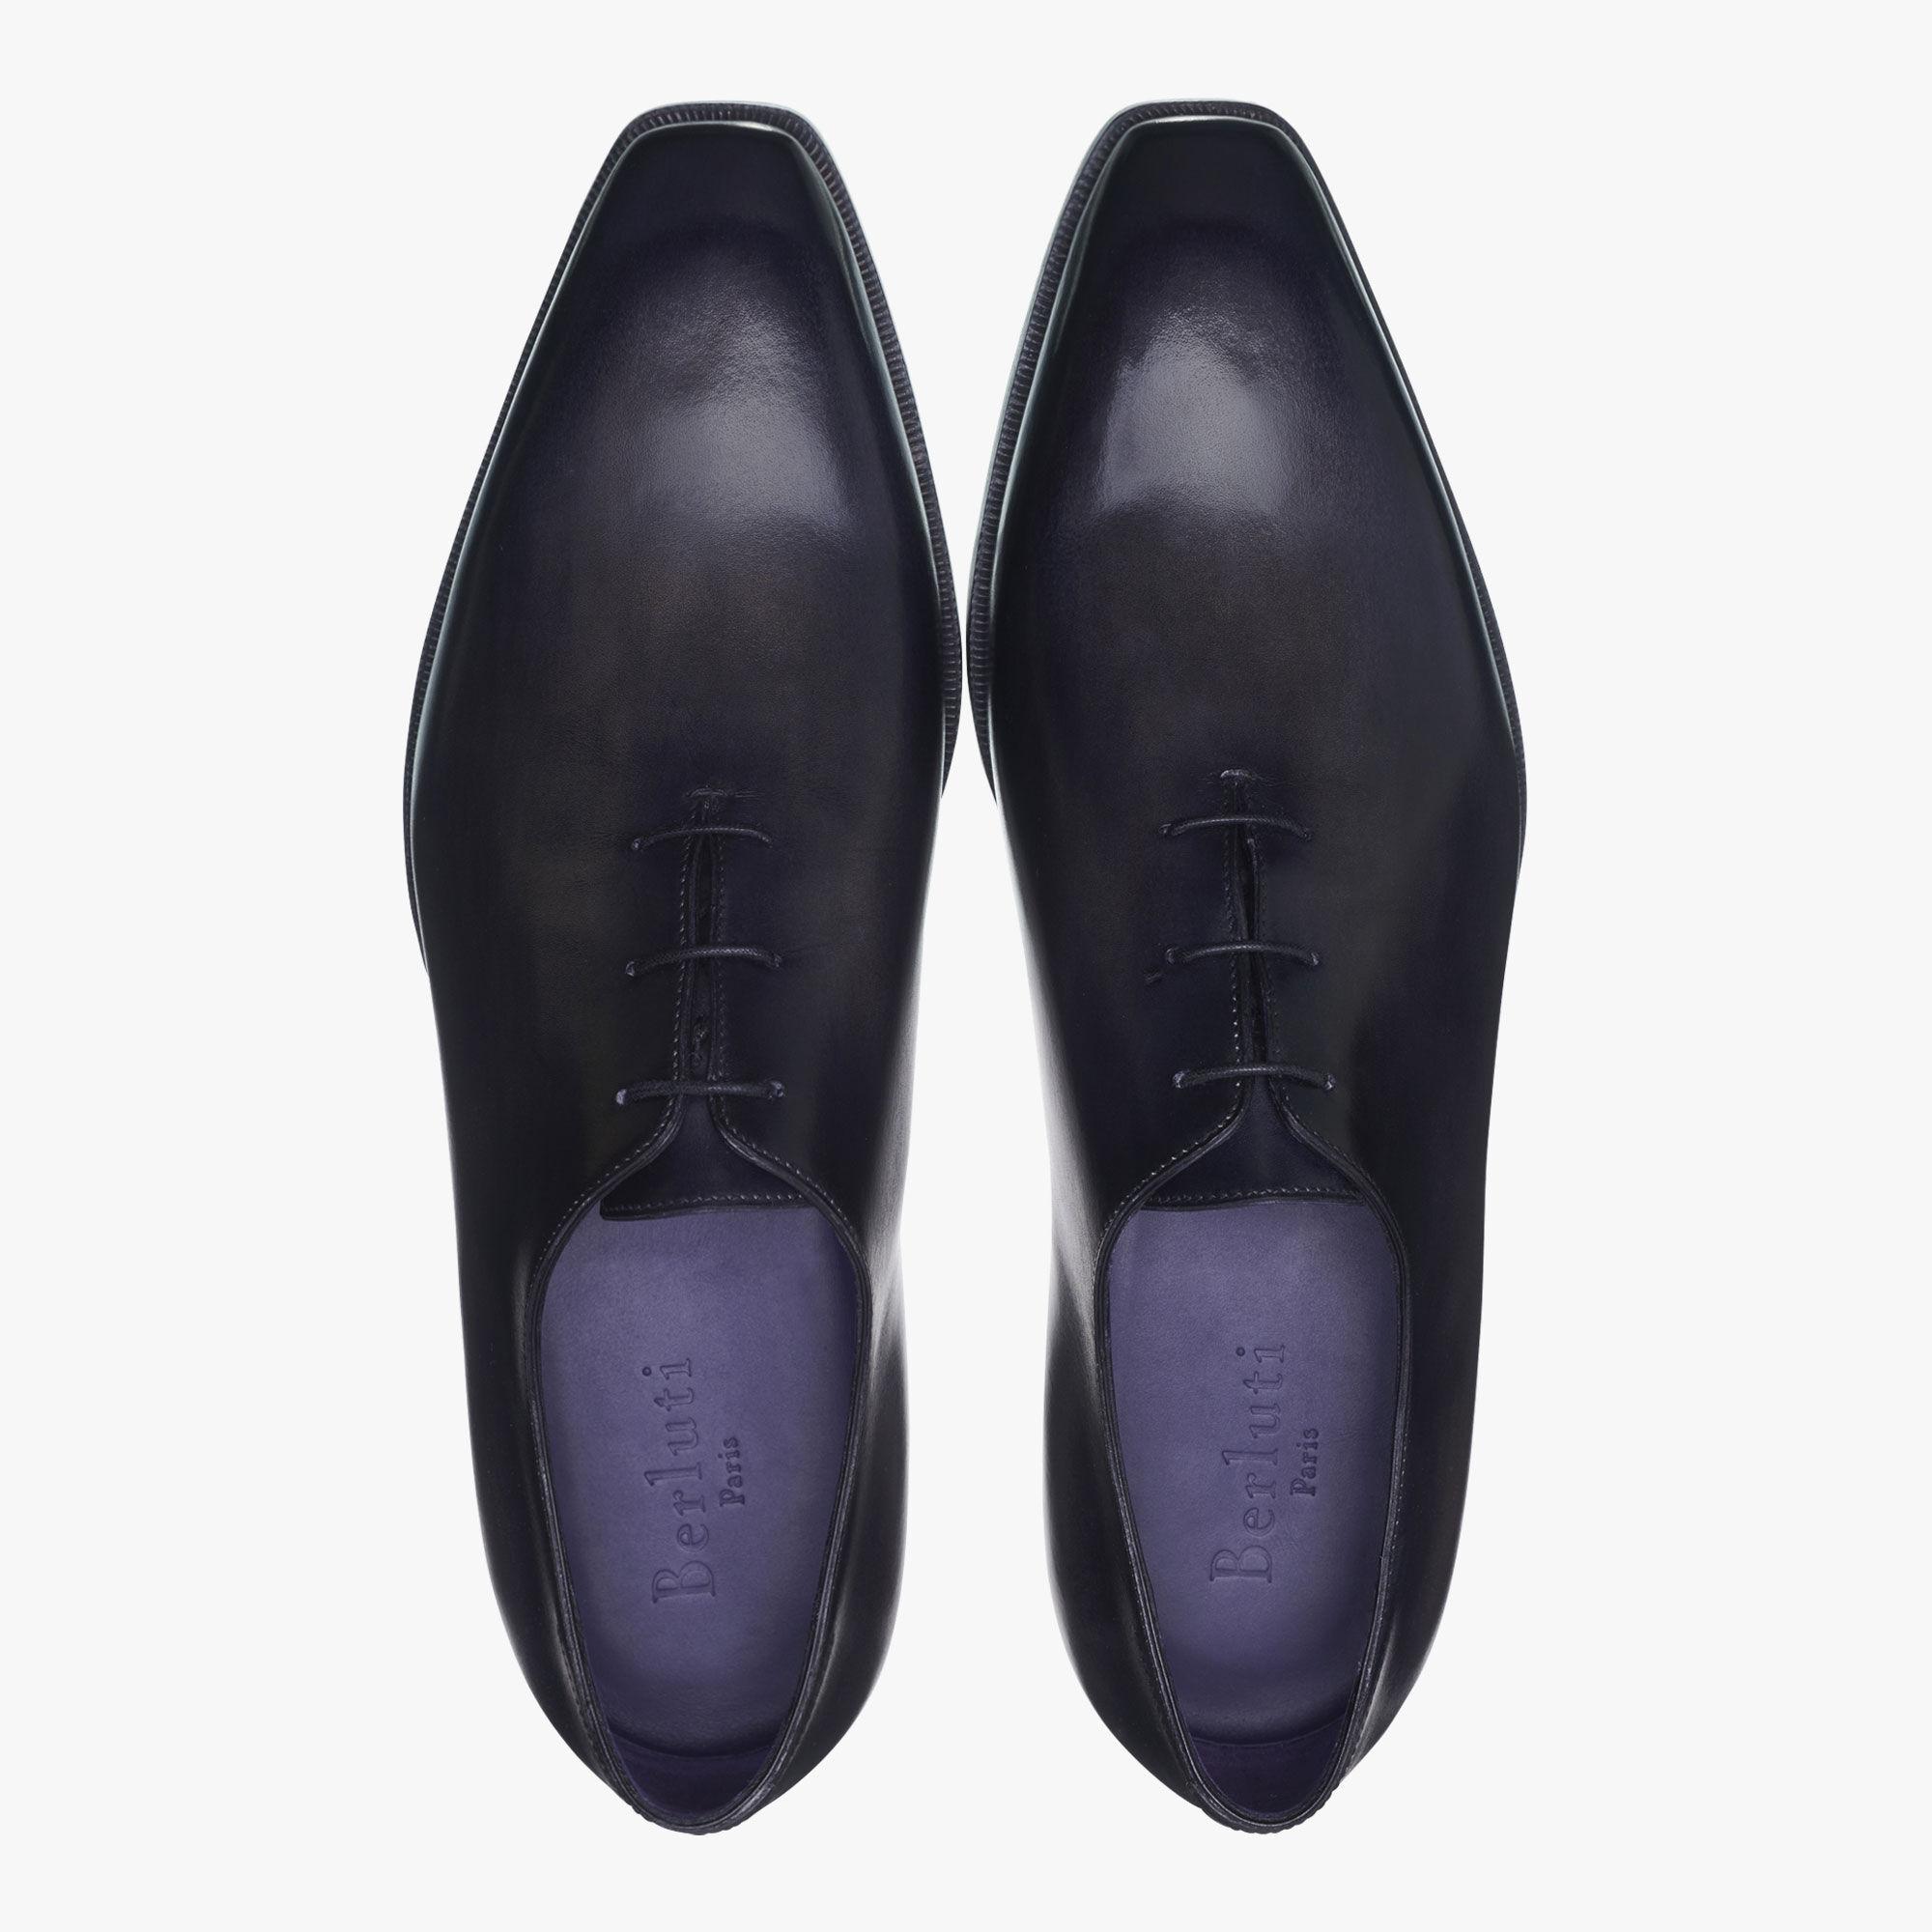 Alessandro Démesure Leather Oxford, Leather Sole, NERO, hi-res